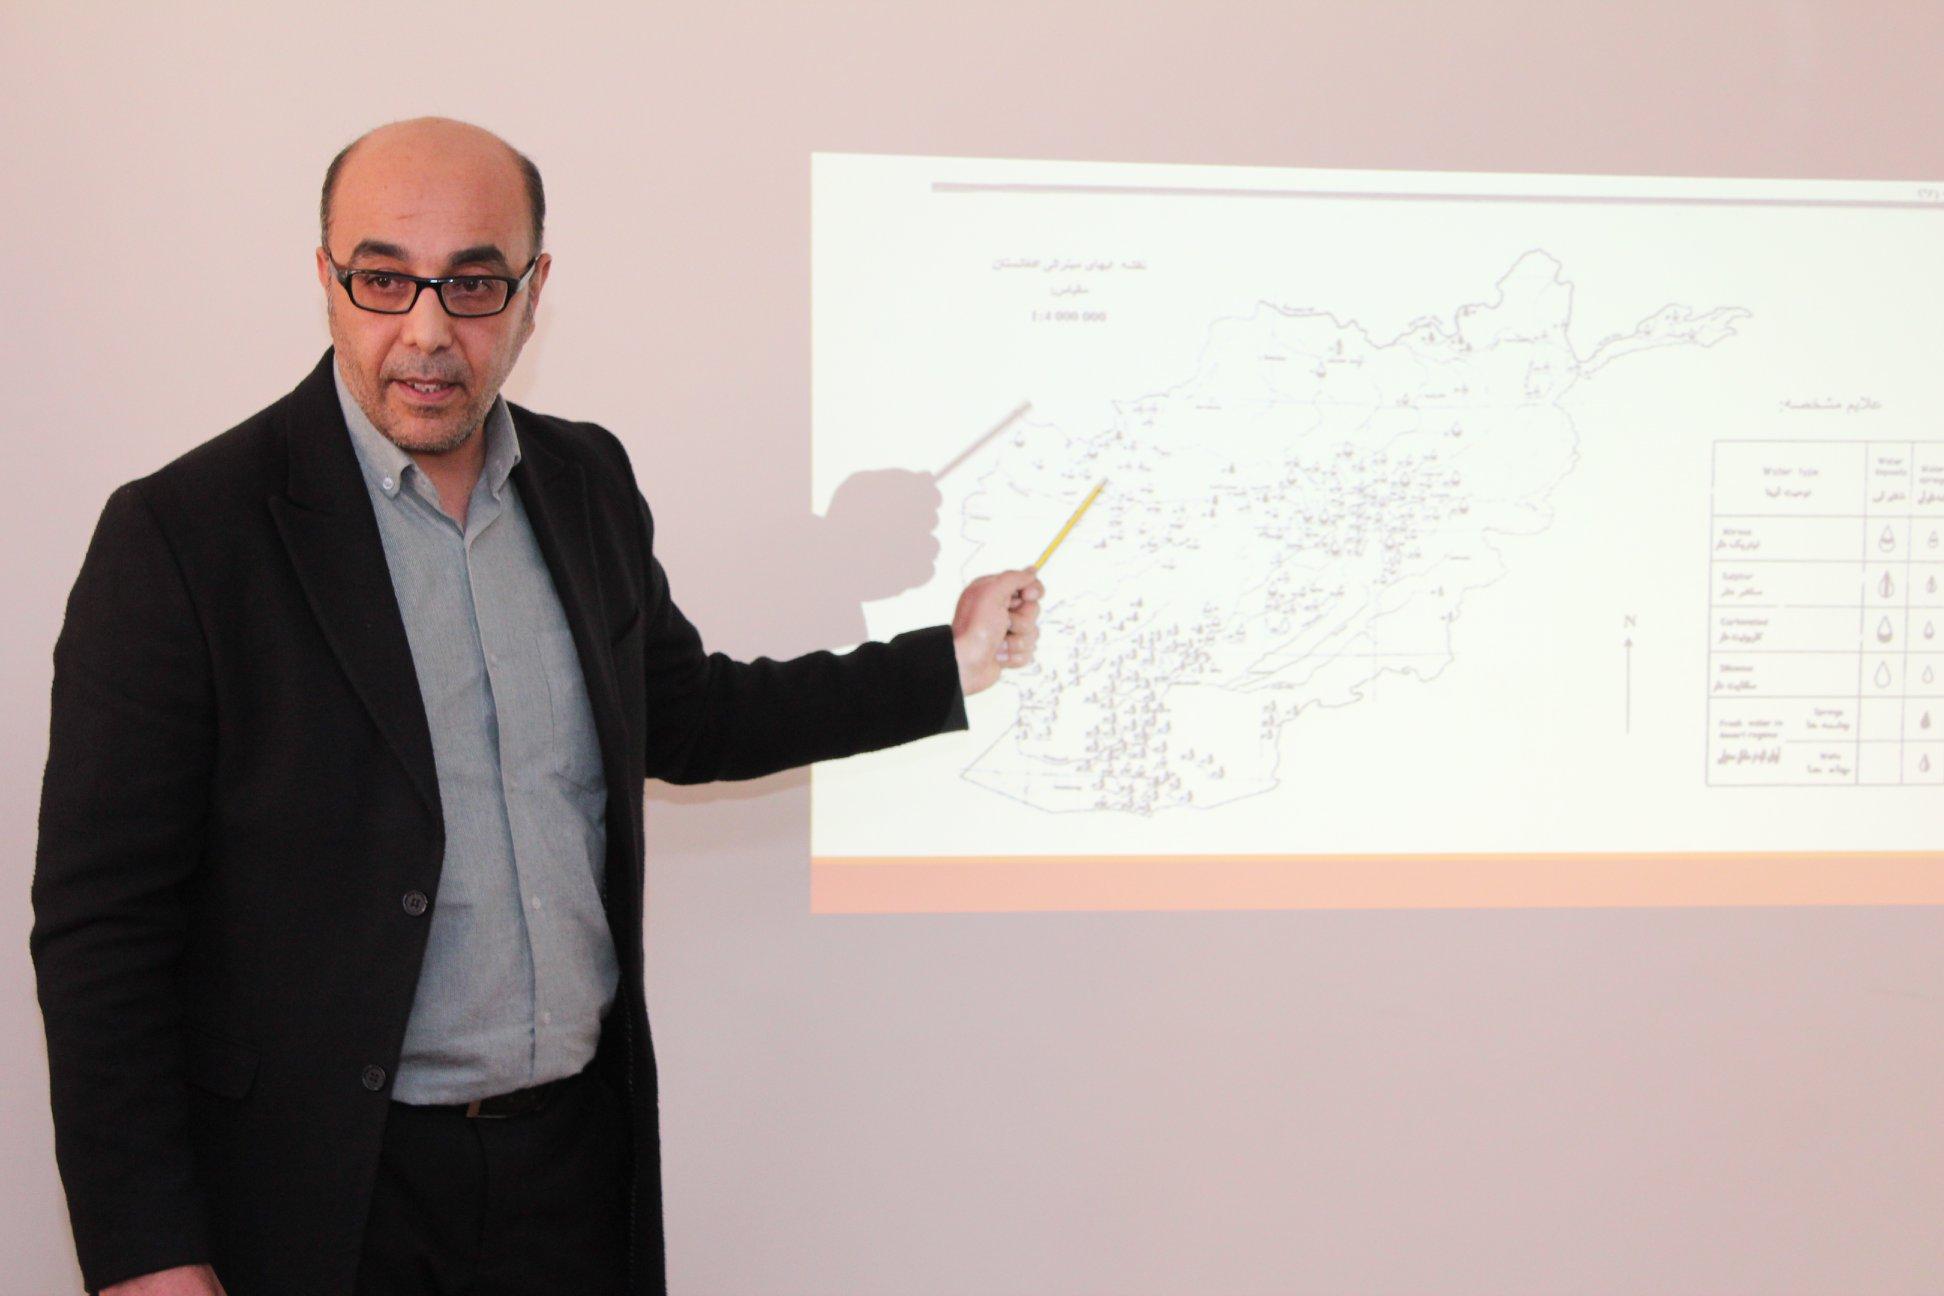 محقق محمد نذير حيران